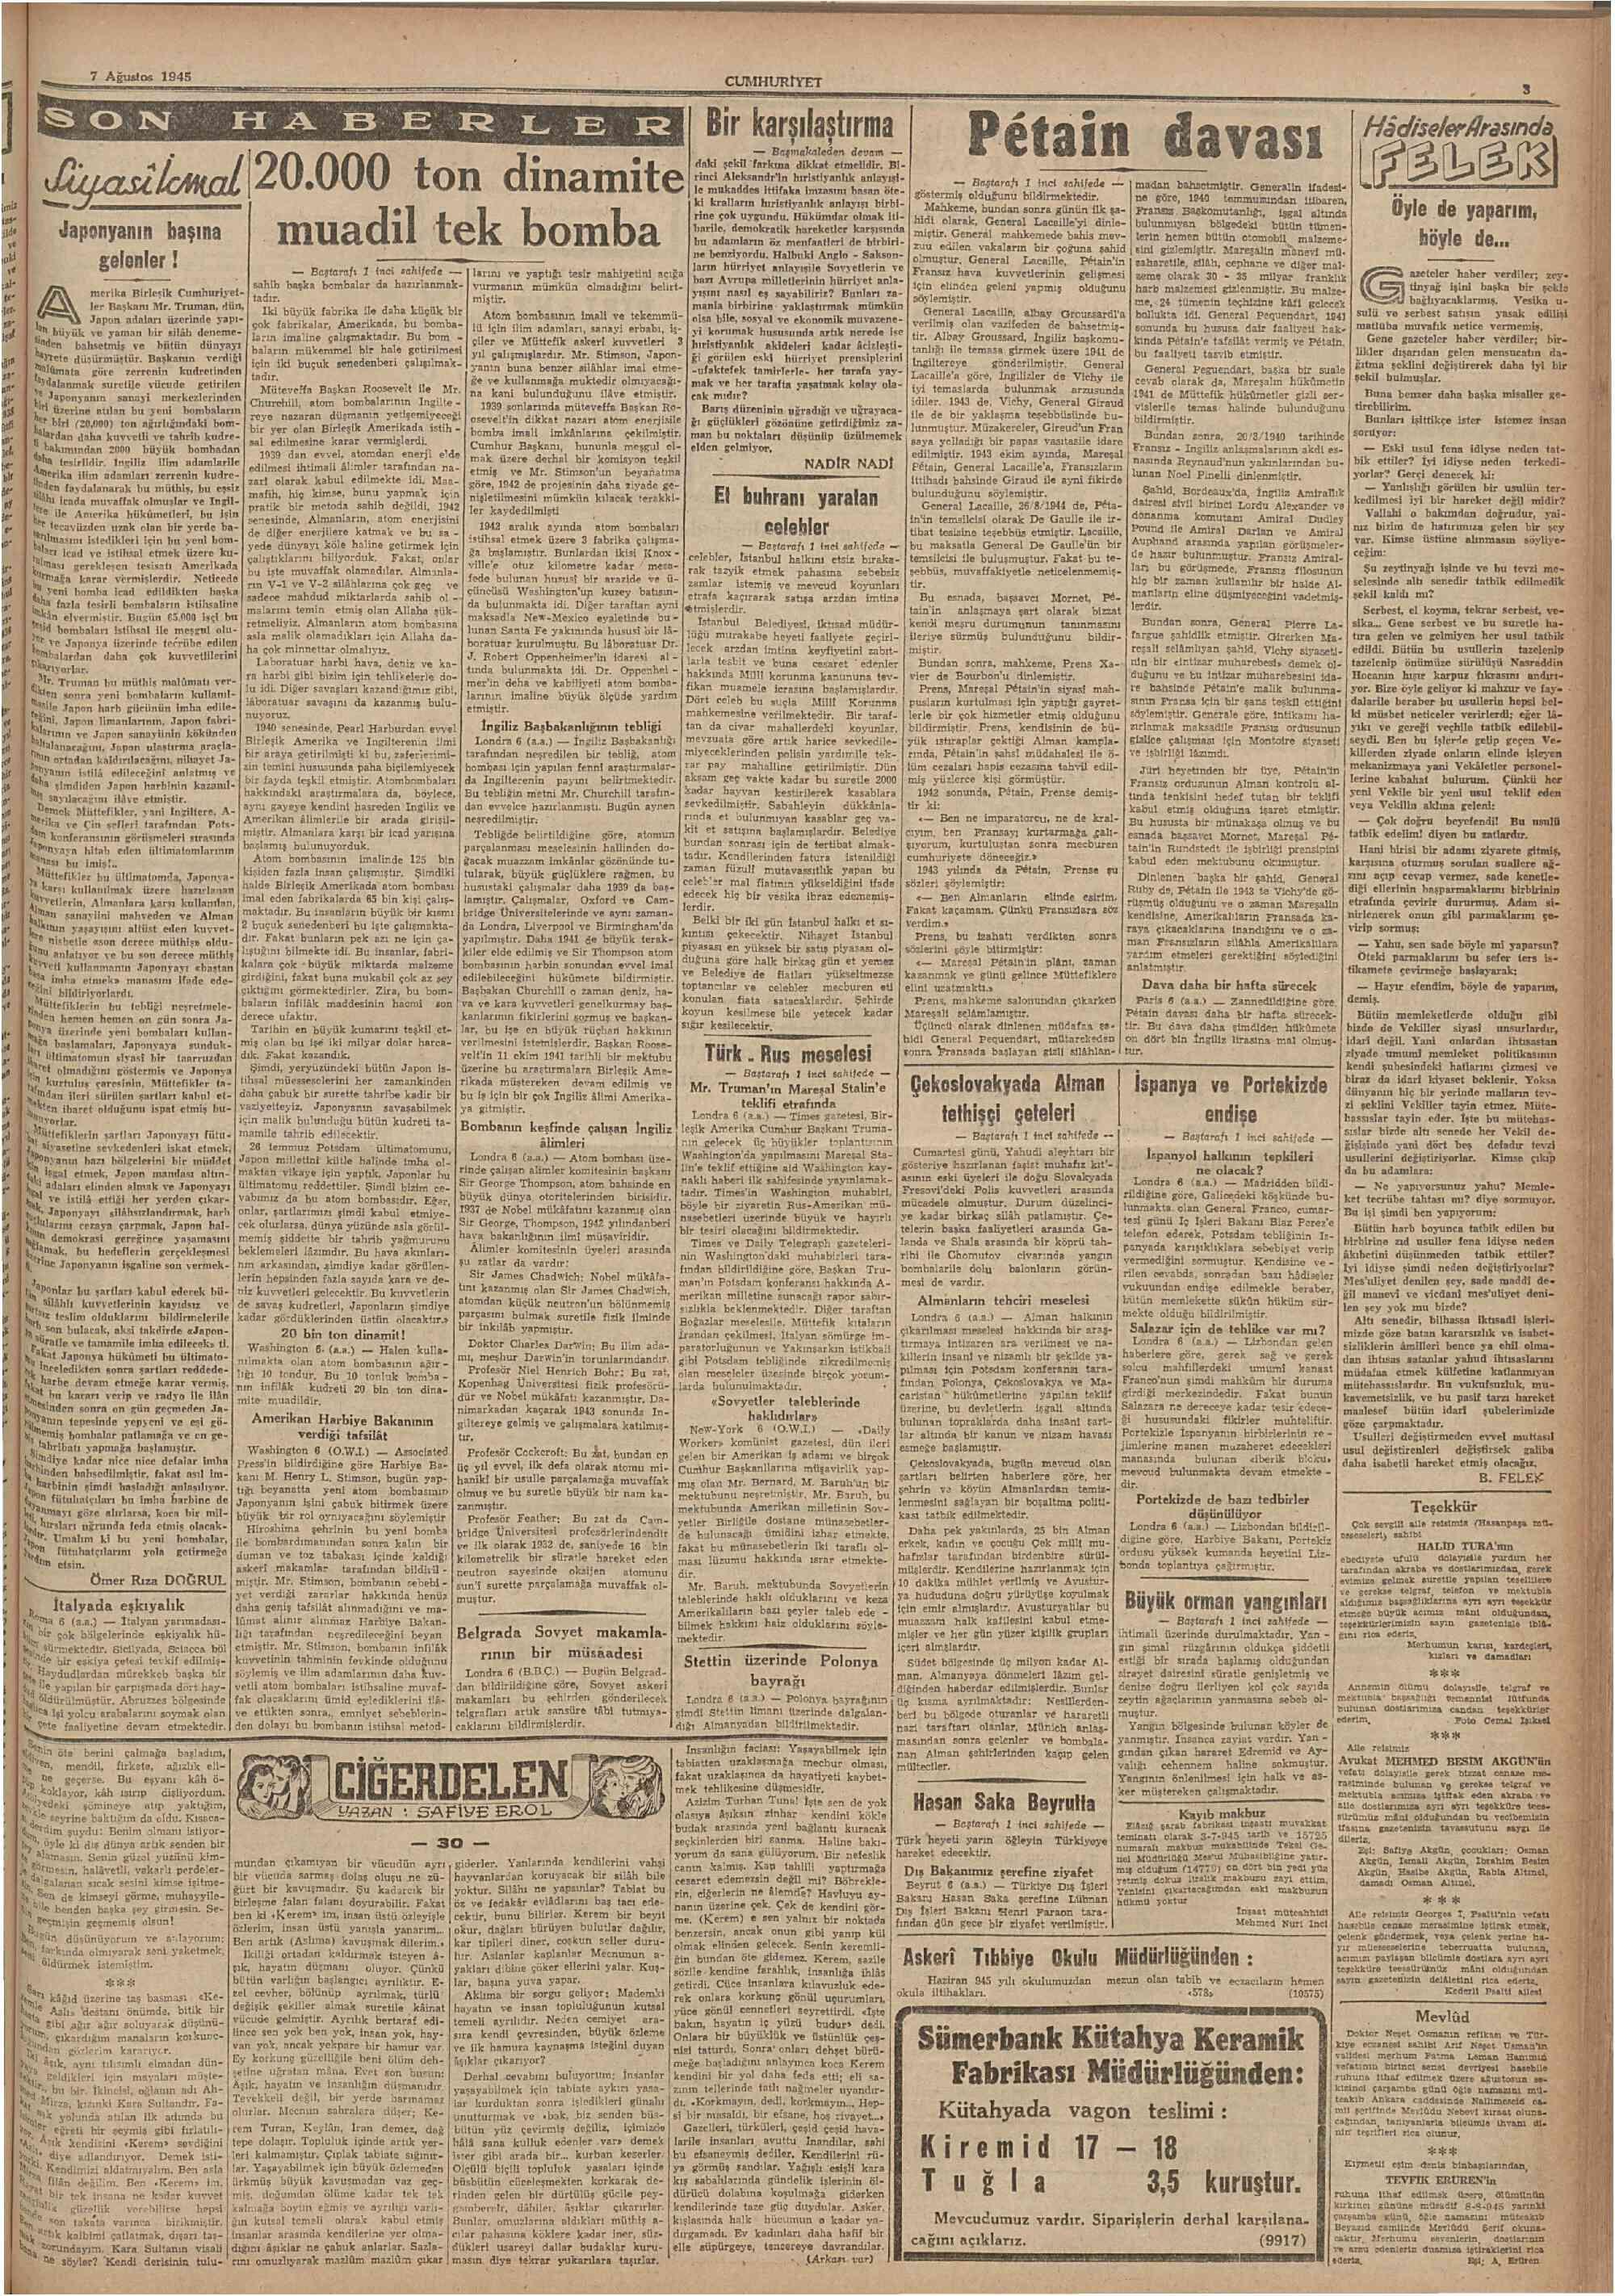 Cumhuriyet 7 Ağustos 1945 Sayfa 3 | Gaste Arşivi